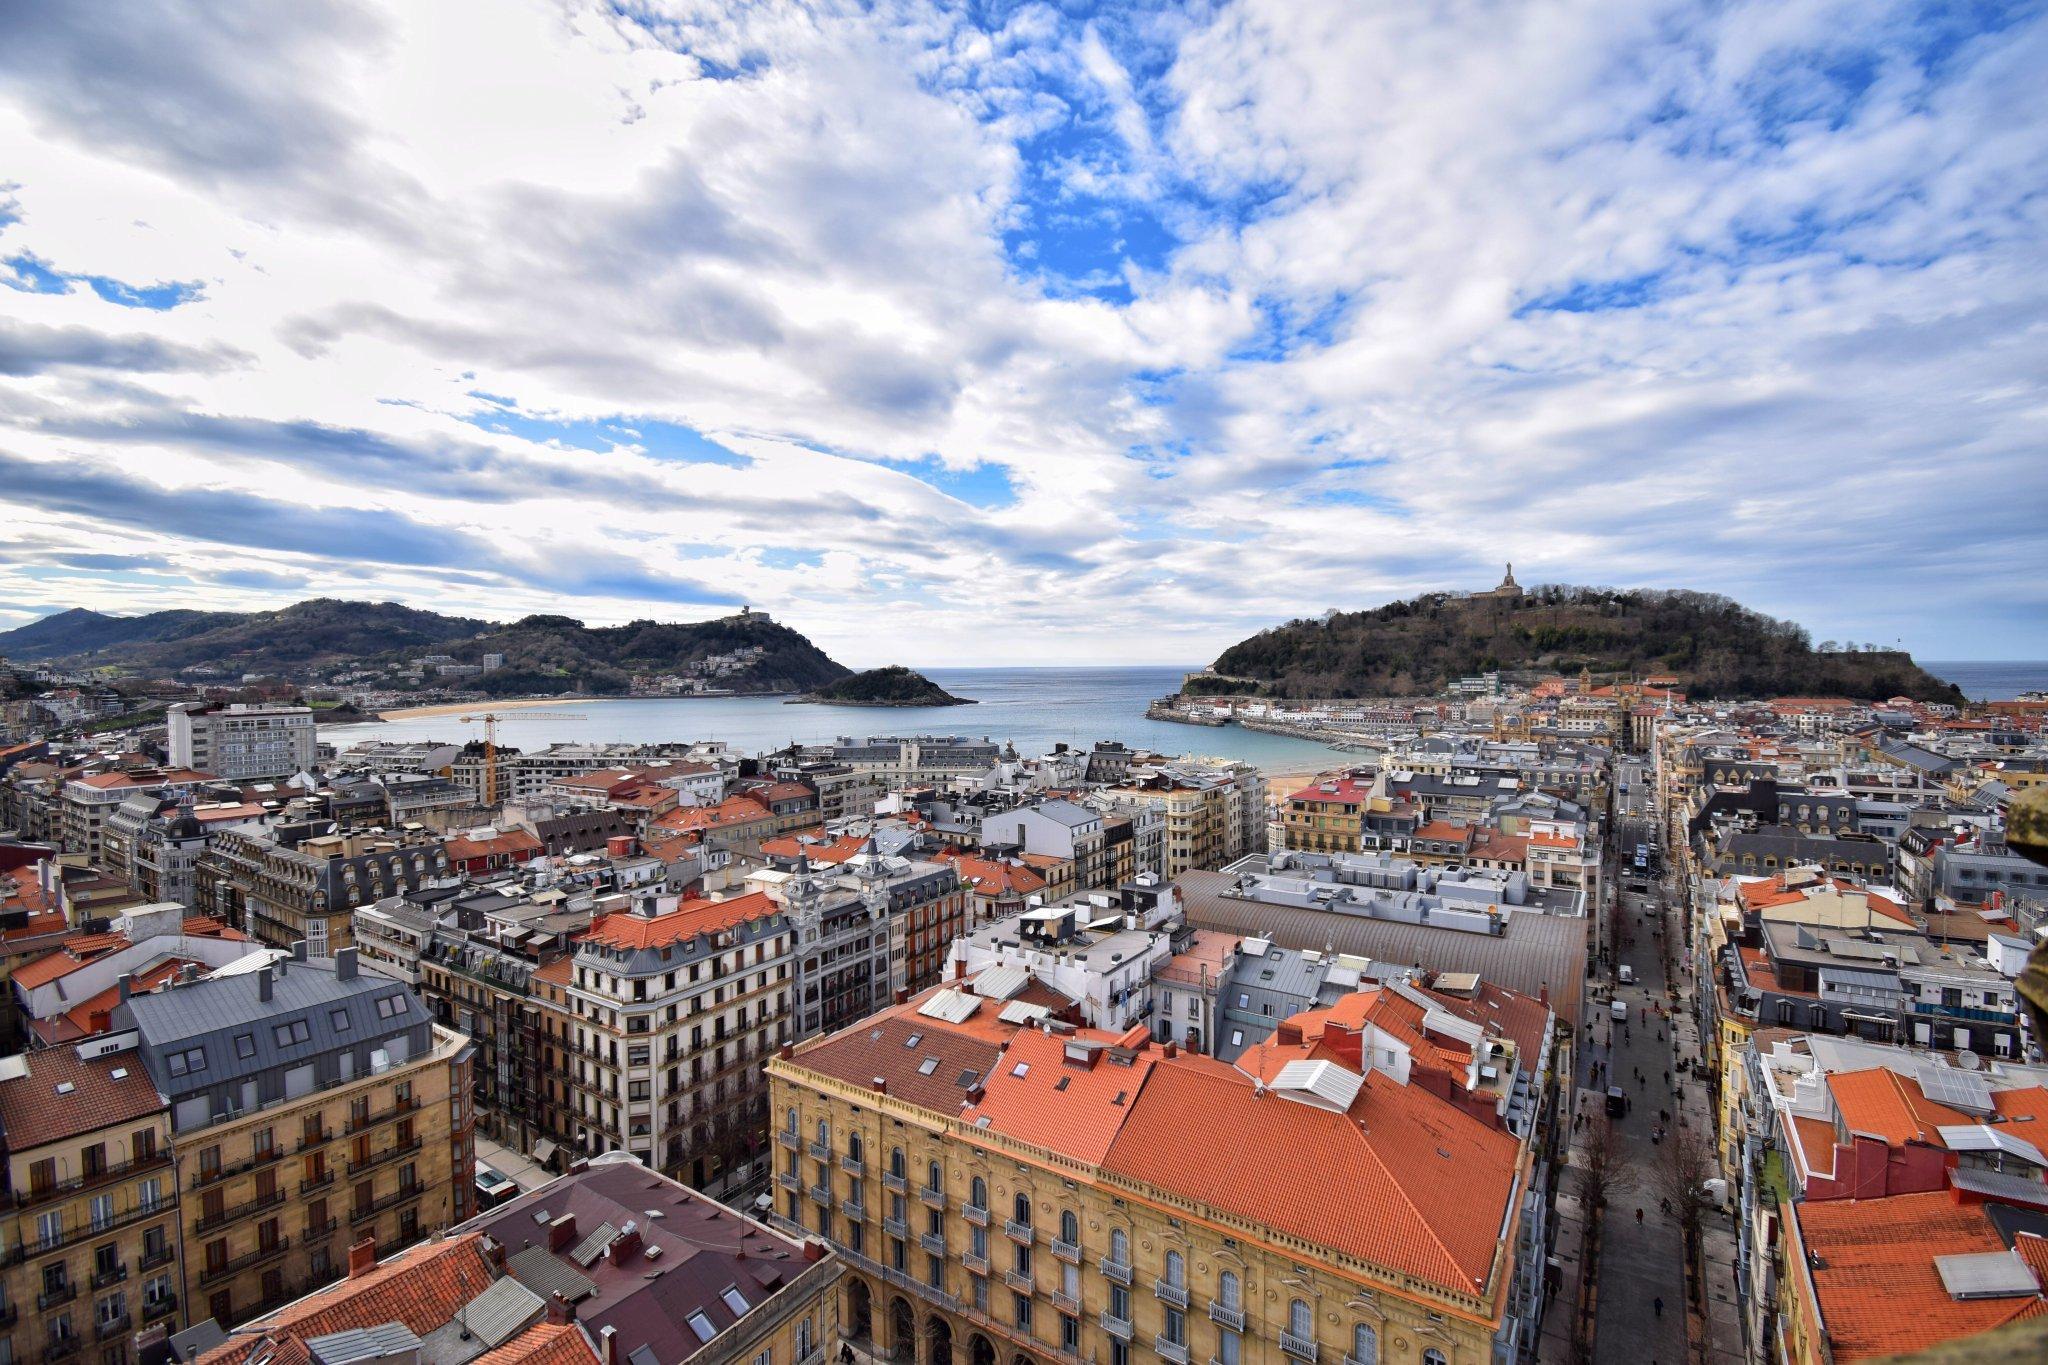 Donostia / San Sebastián . Por @EnekoGoia https://t.co/LBvbktXNUN